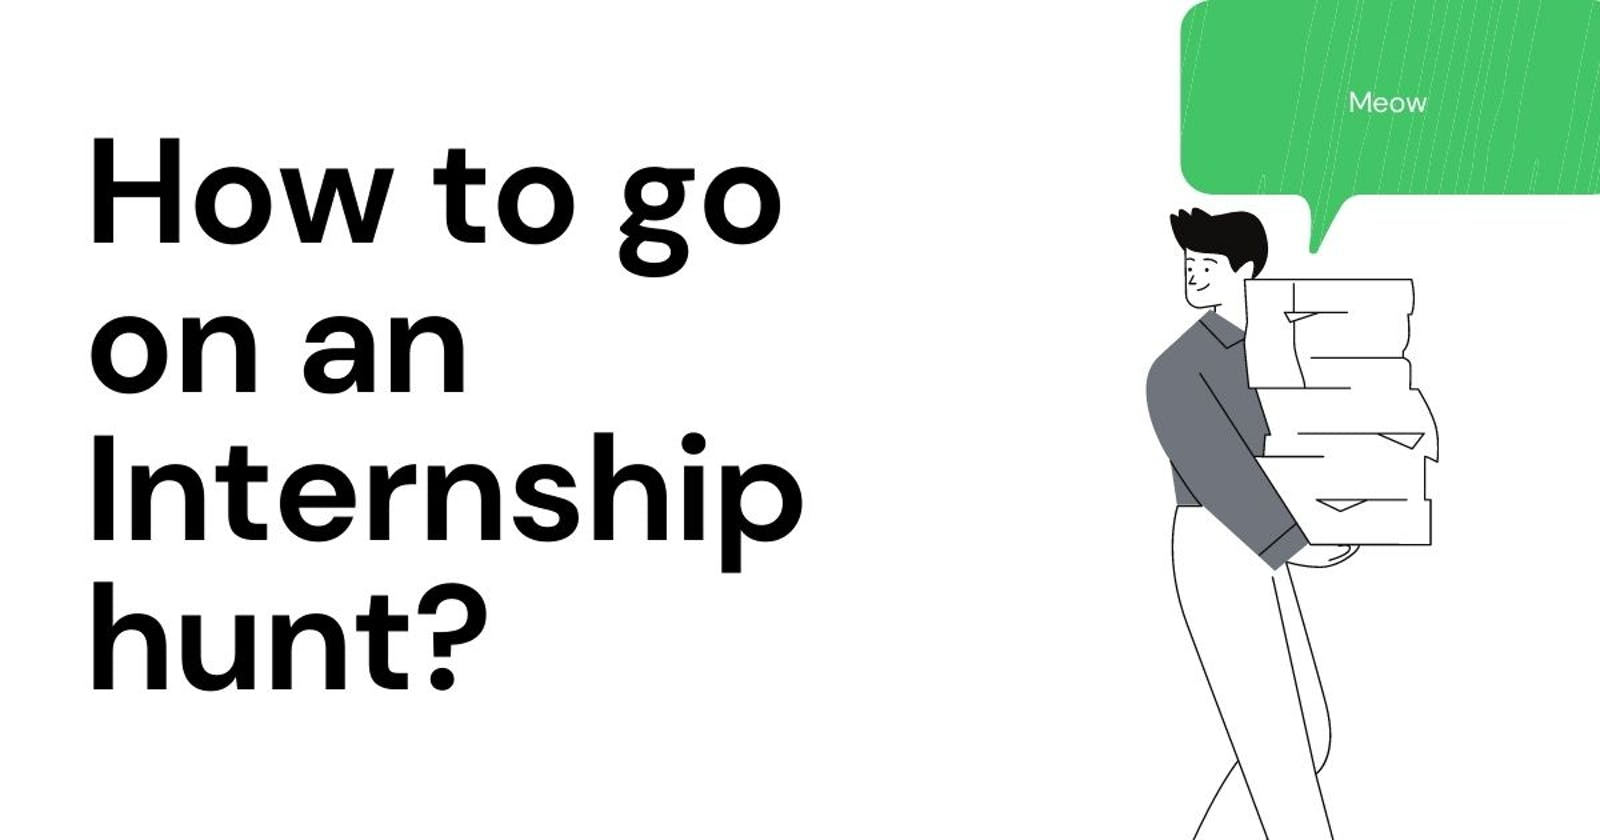 How to go on an Internship hunt?  🎯